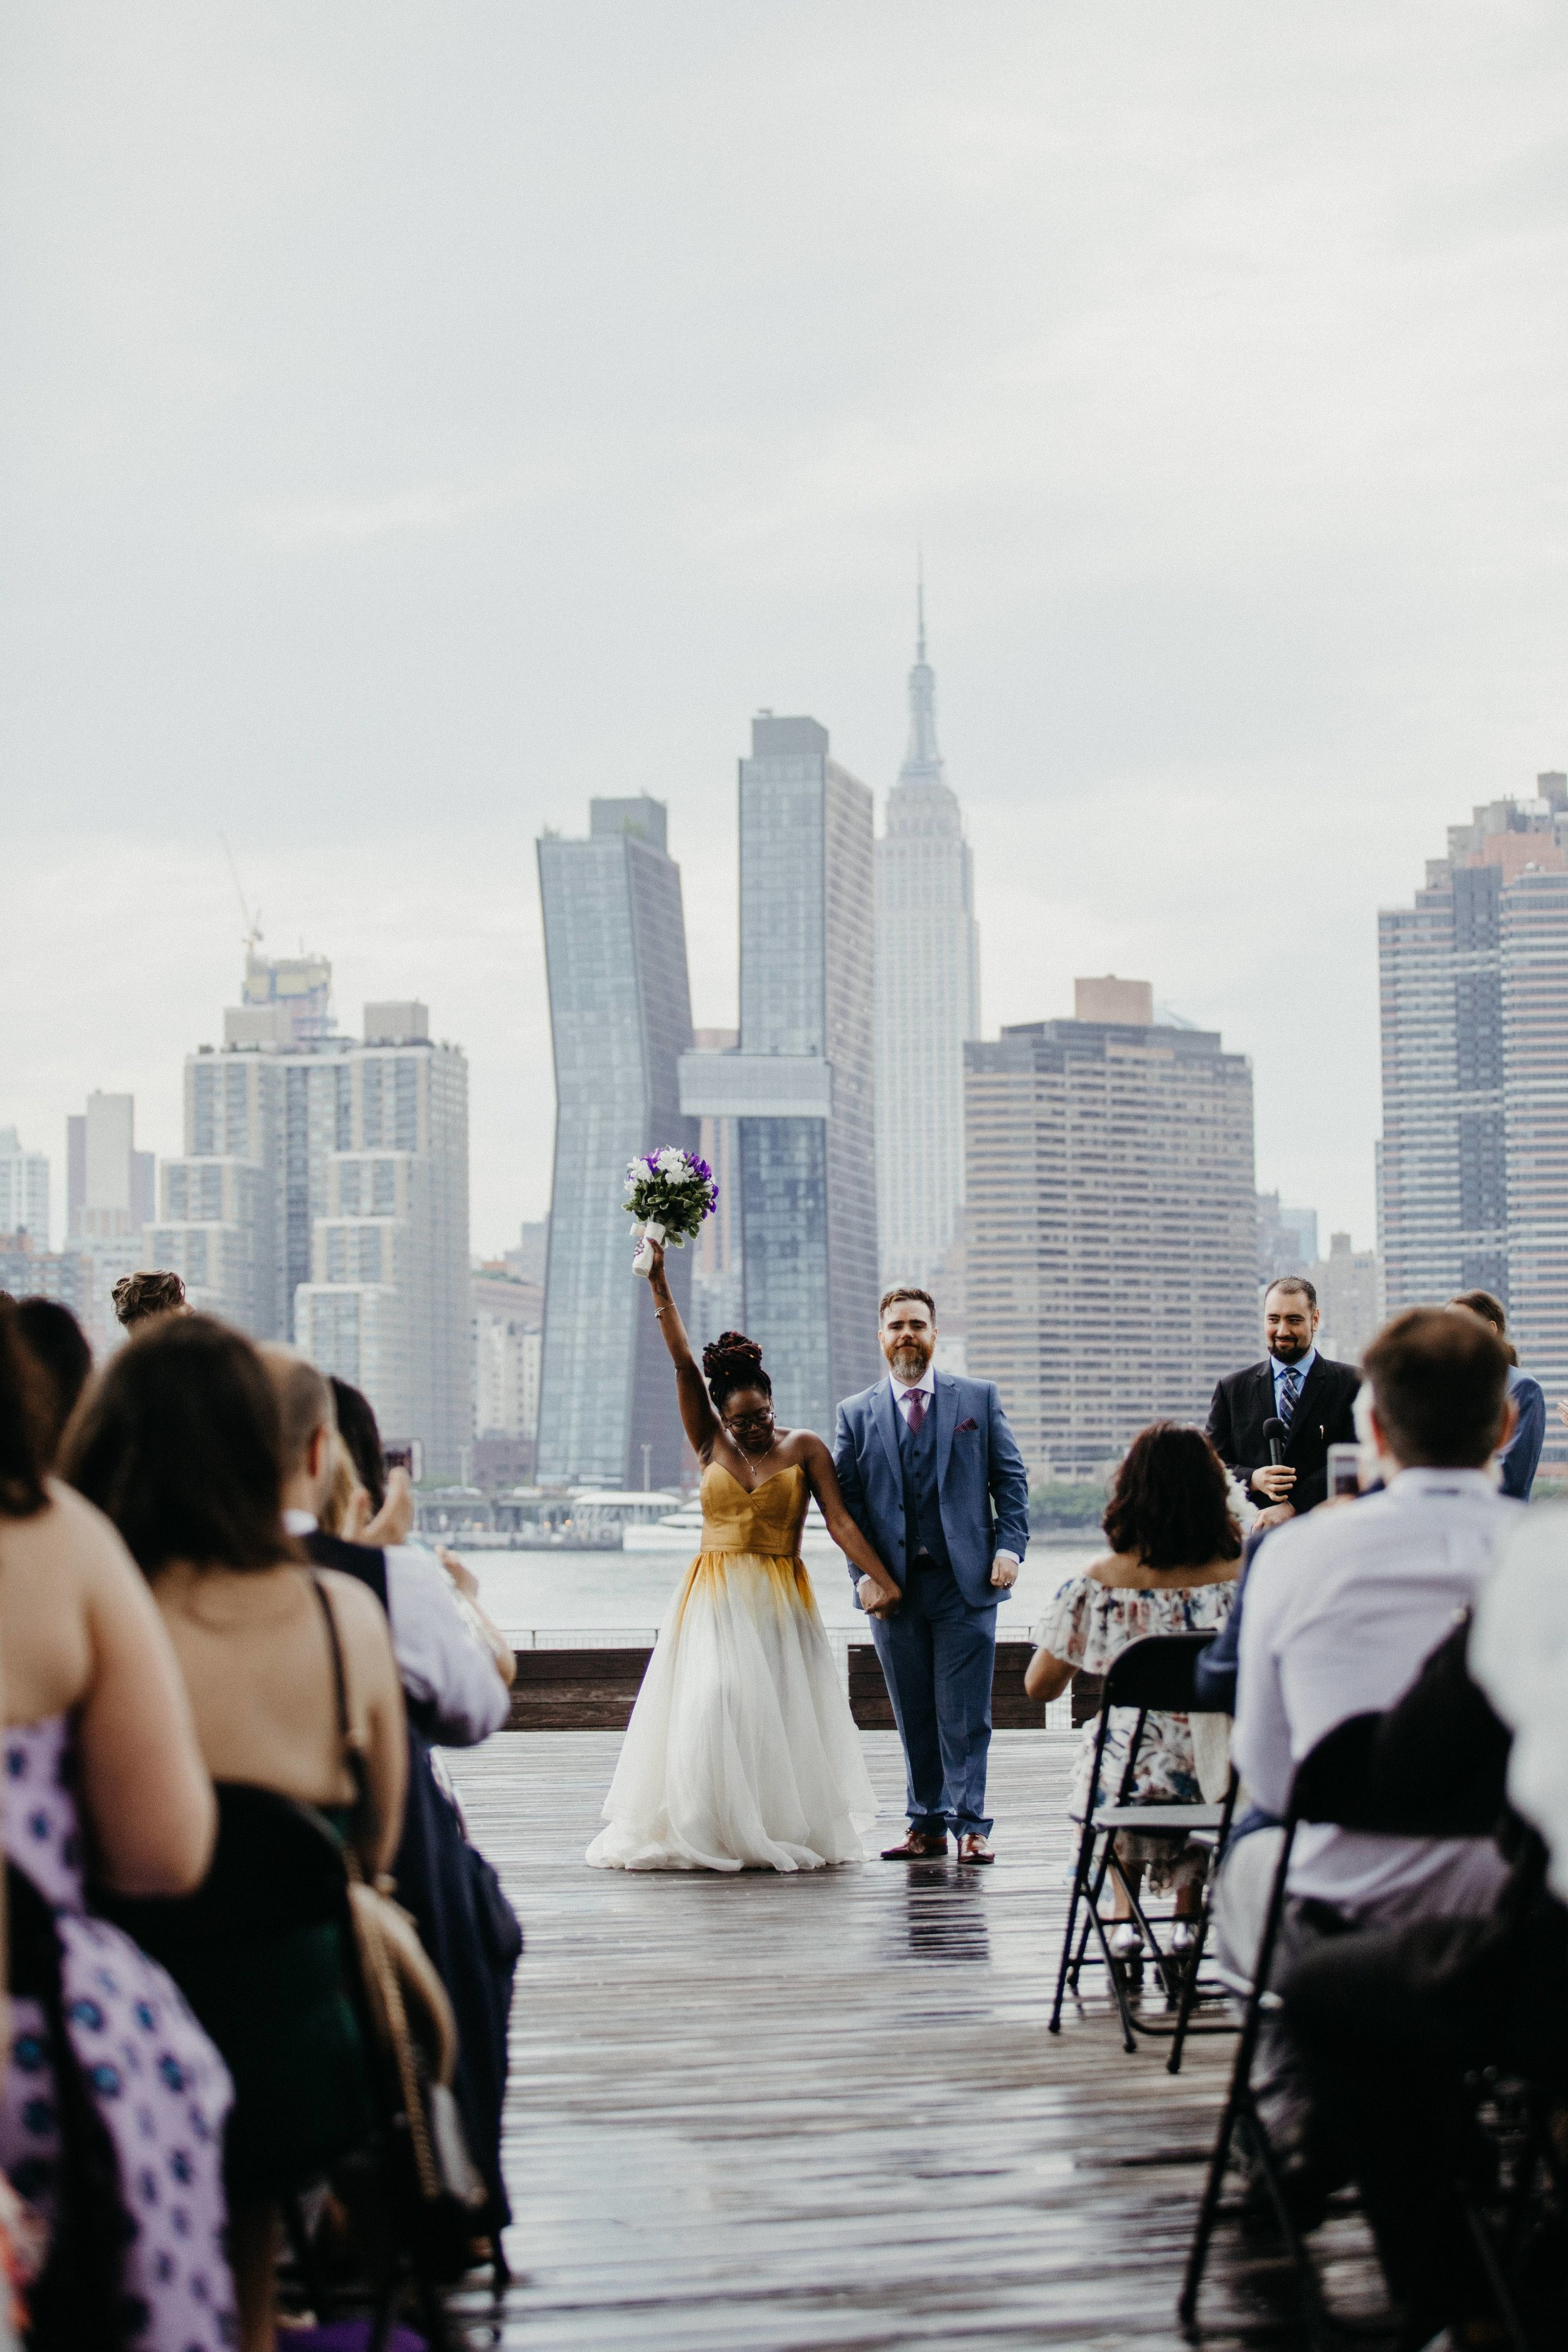 Sevlynn-Photography-Wedding-LIC-Landing-Maiella-NYC-45.jpg